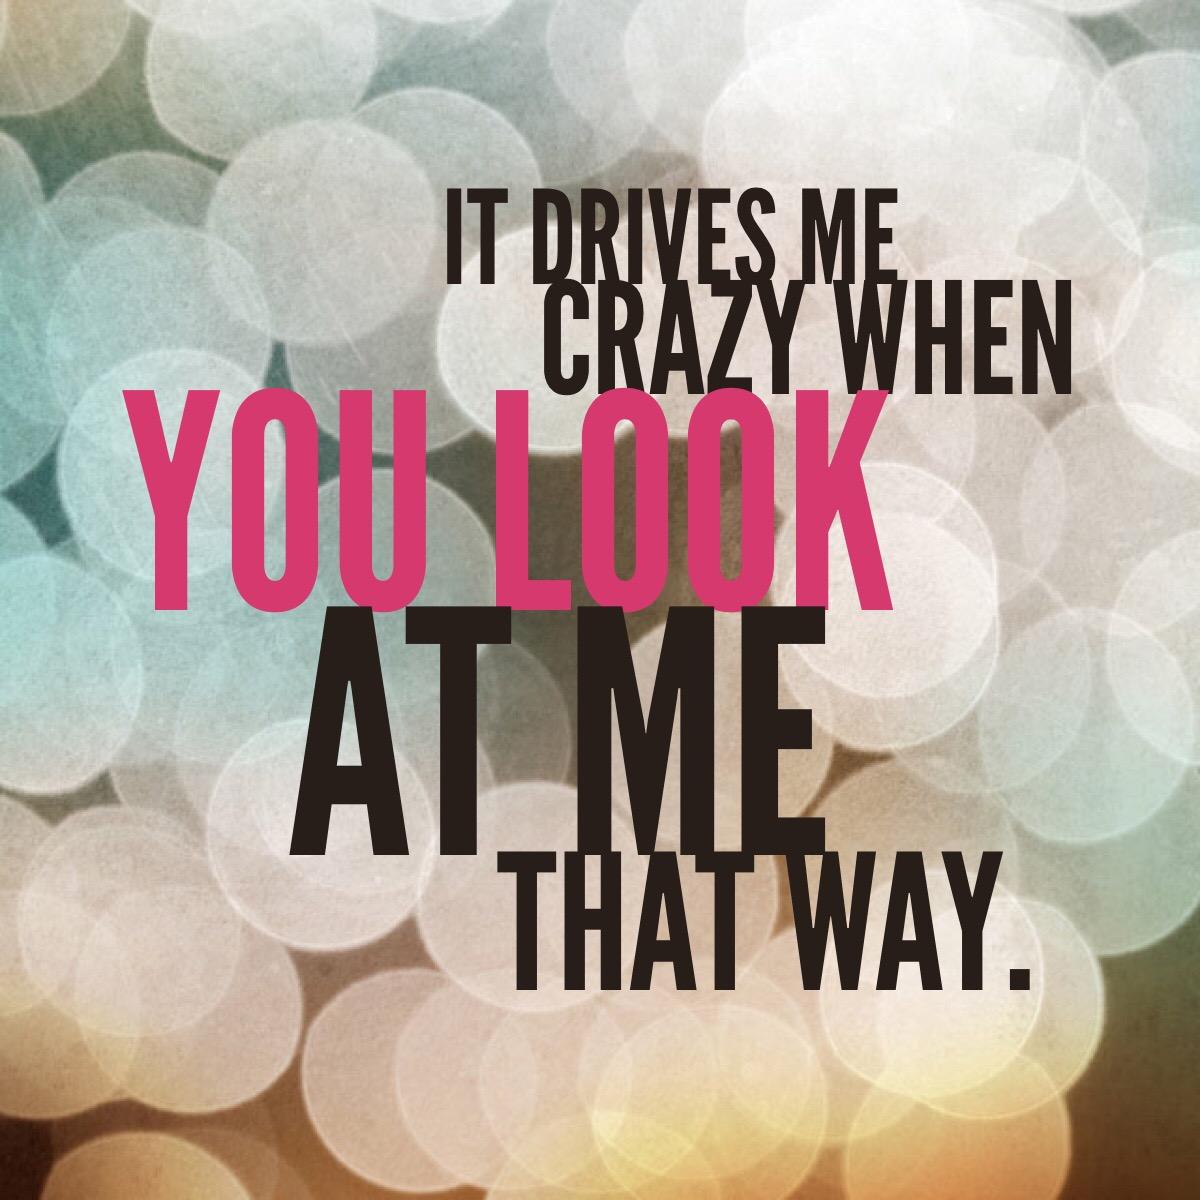 it drives me crazy